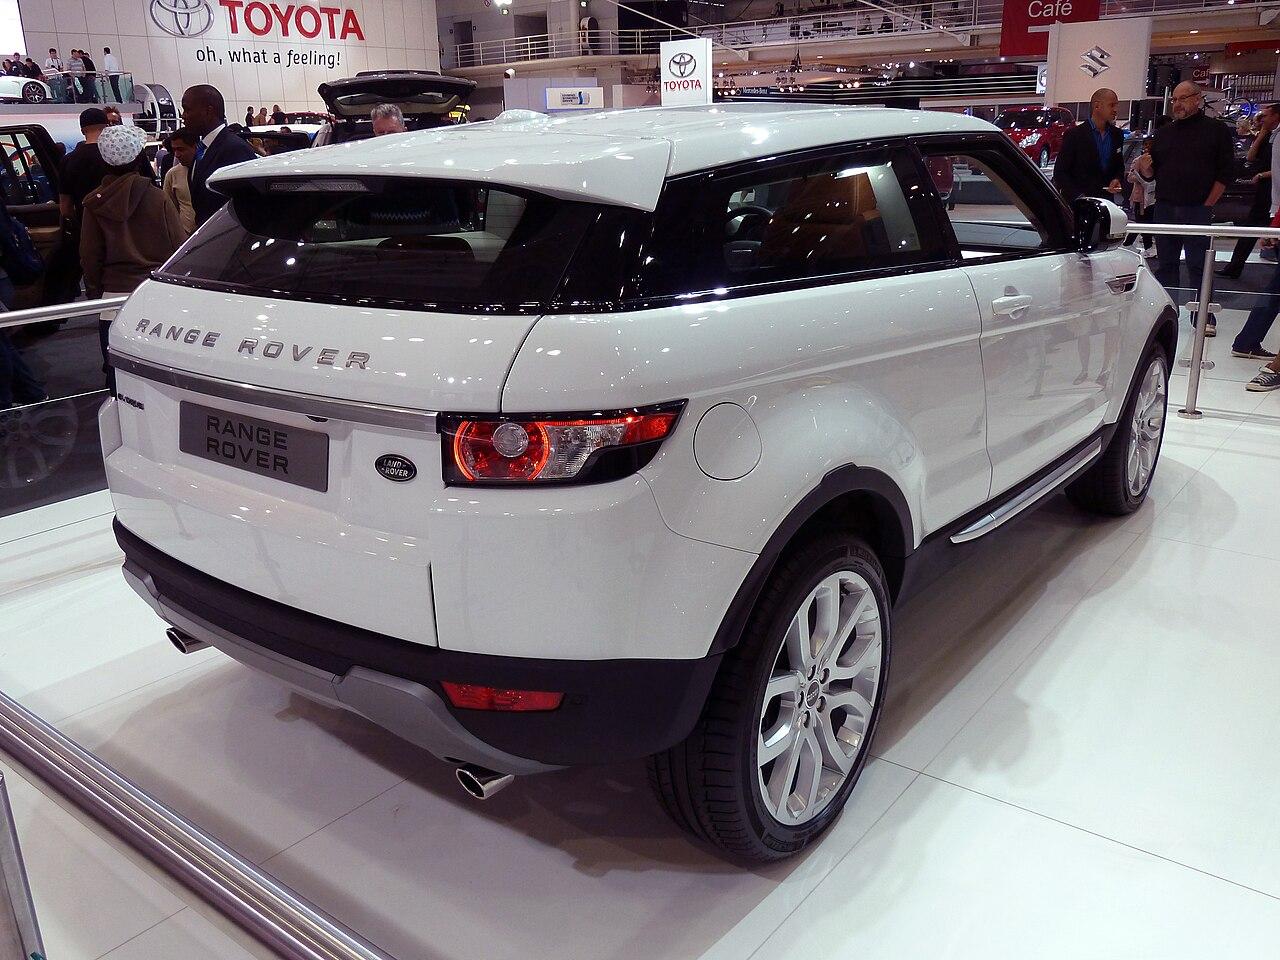 file range rover evoque 3 door wagon prototype 2010 10. Black Bedroom Furniture Sets. Home Design Ideas